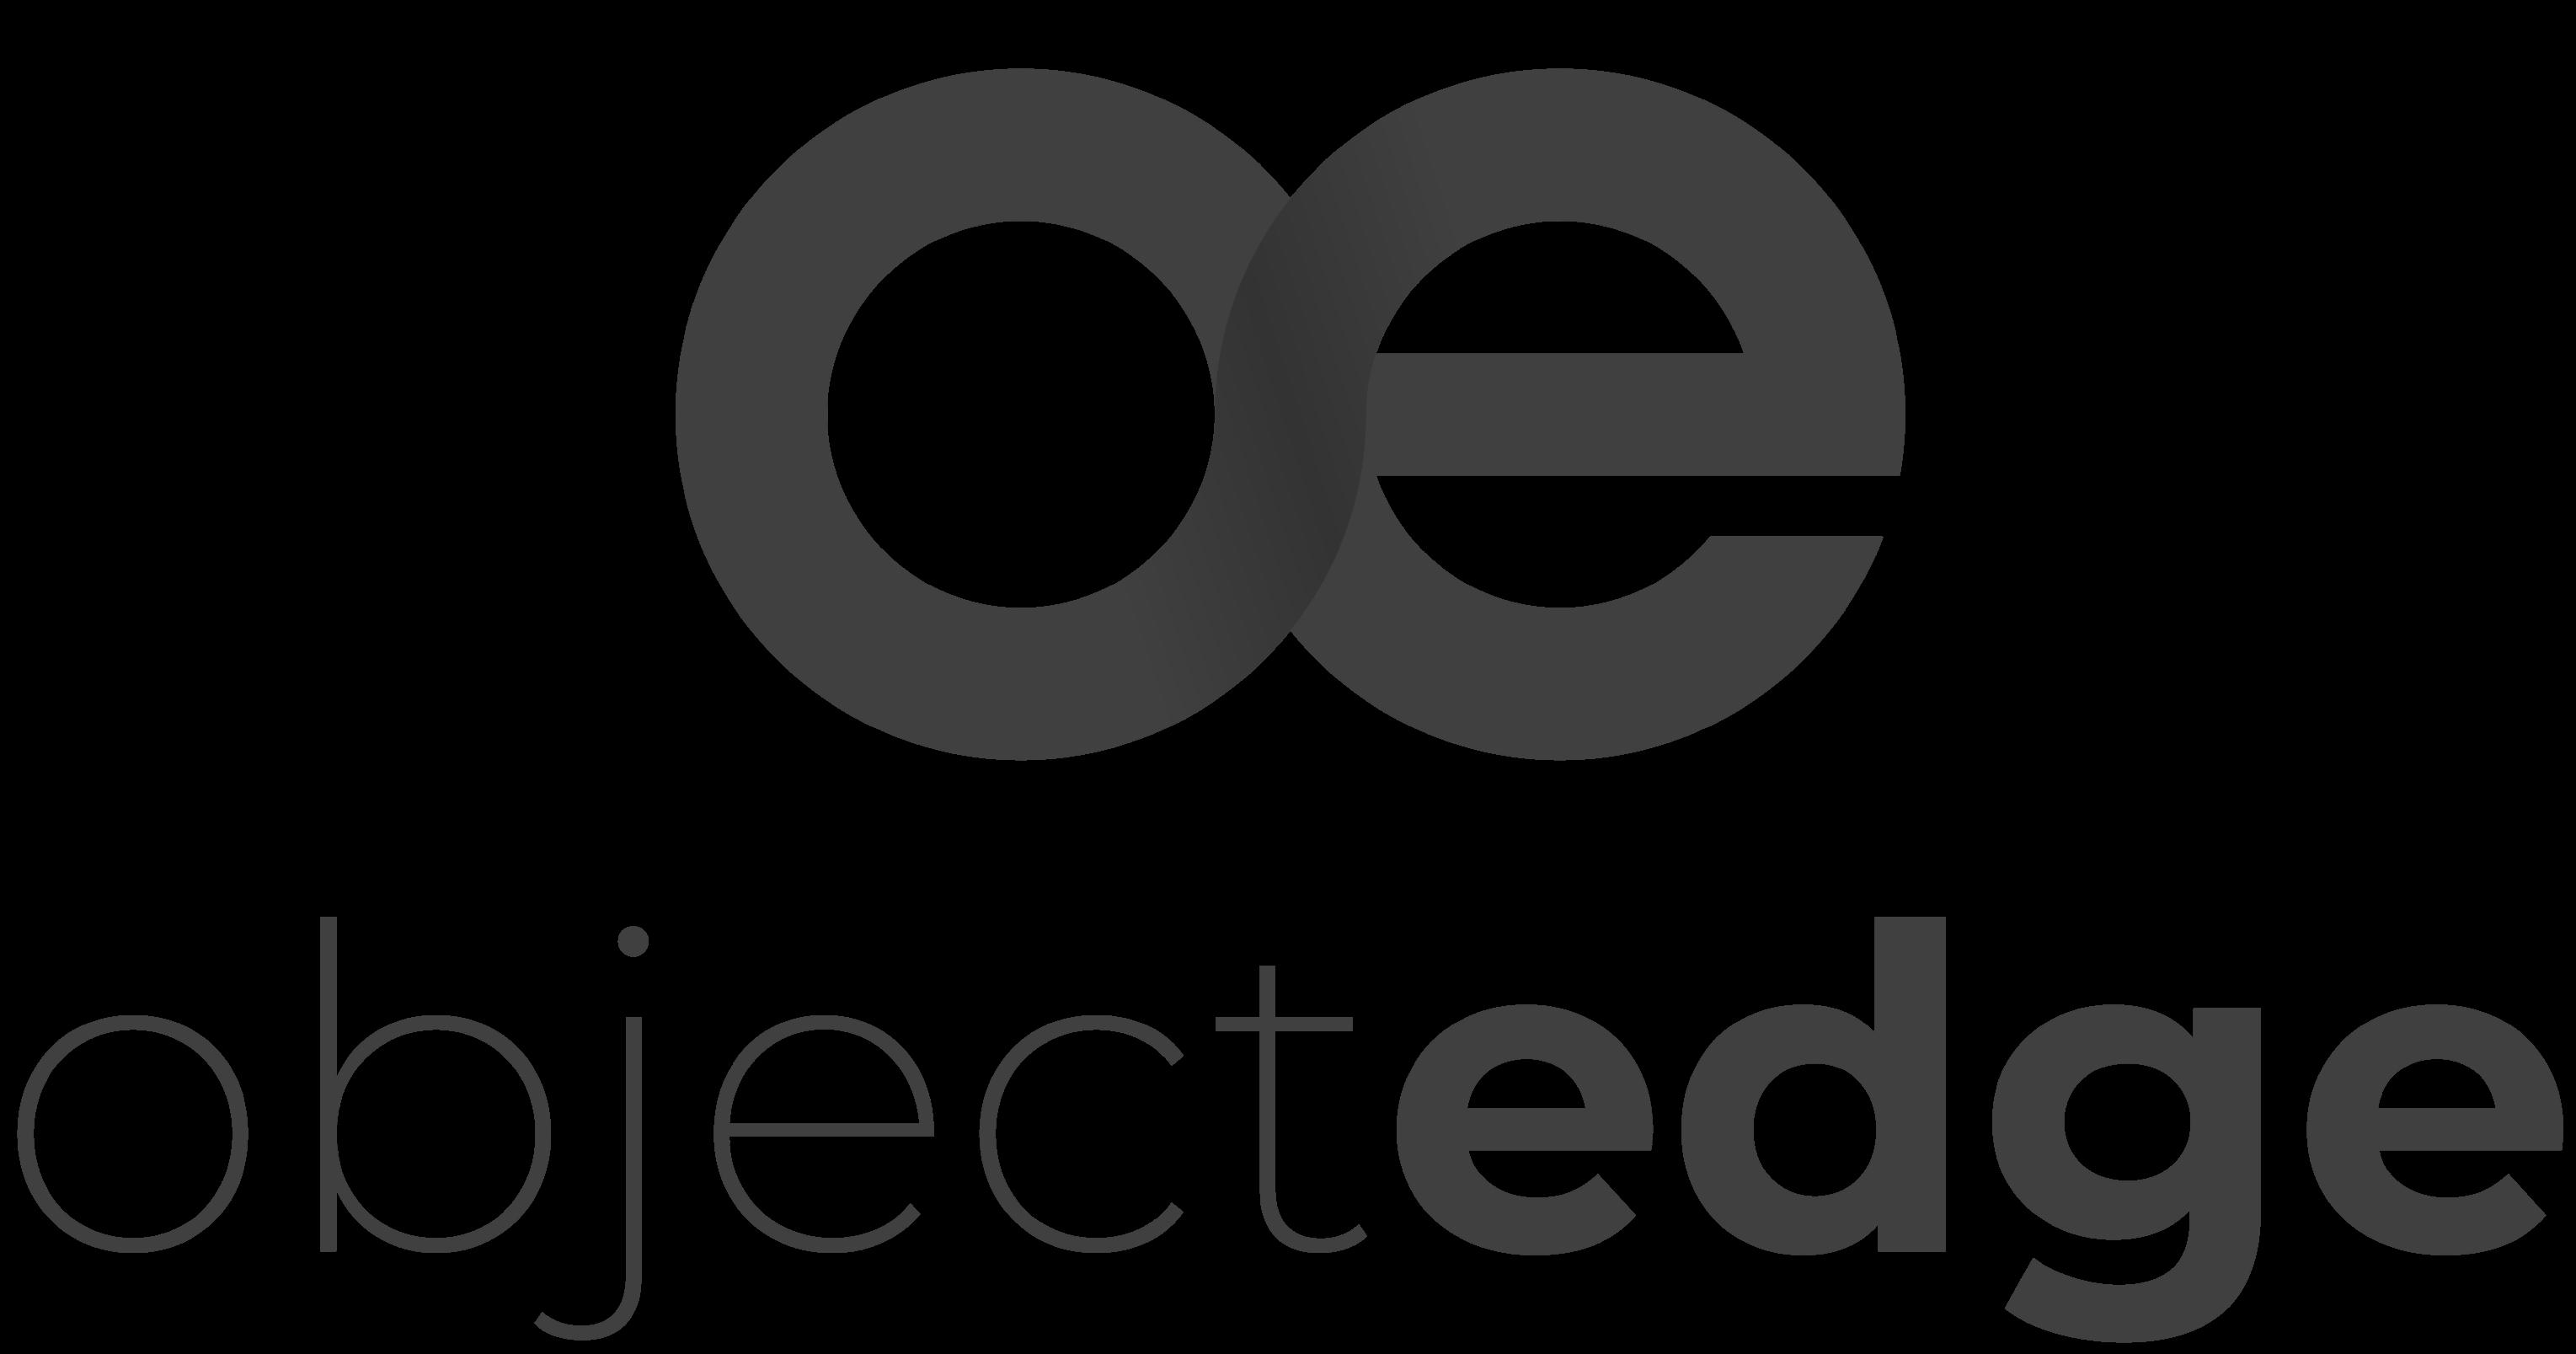 object-edge logo